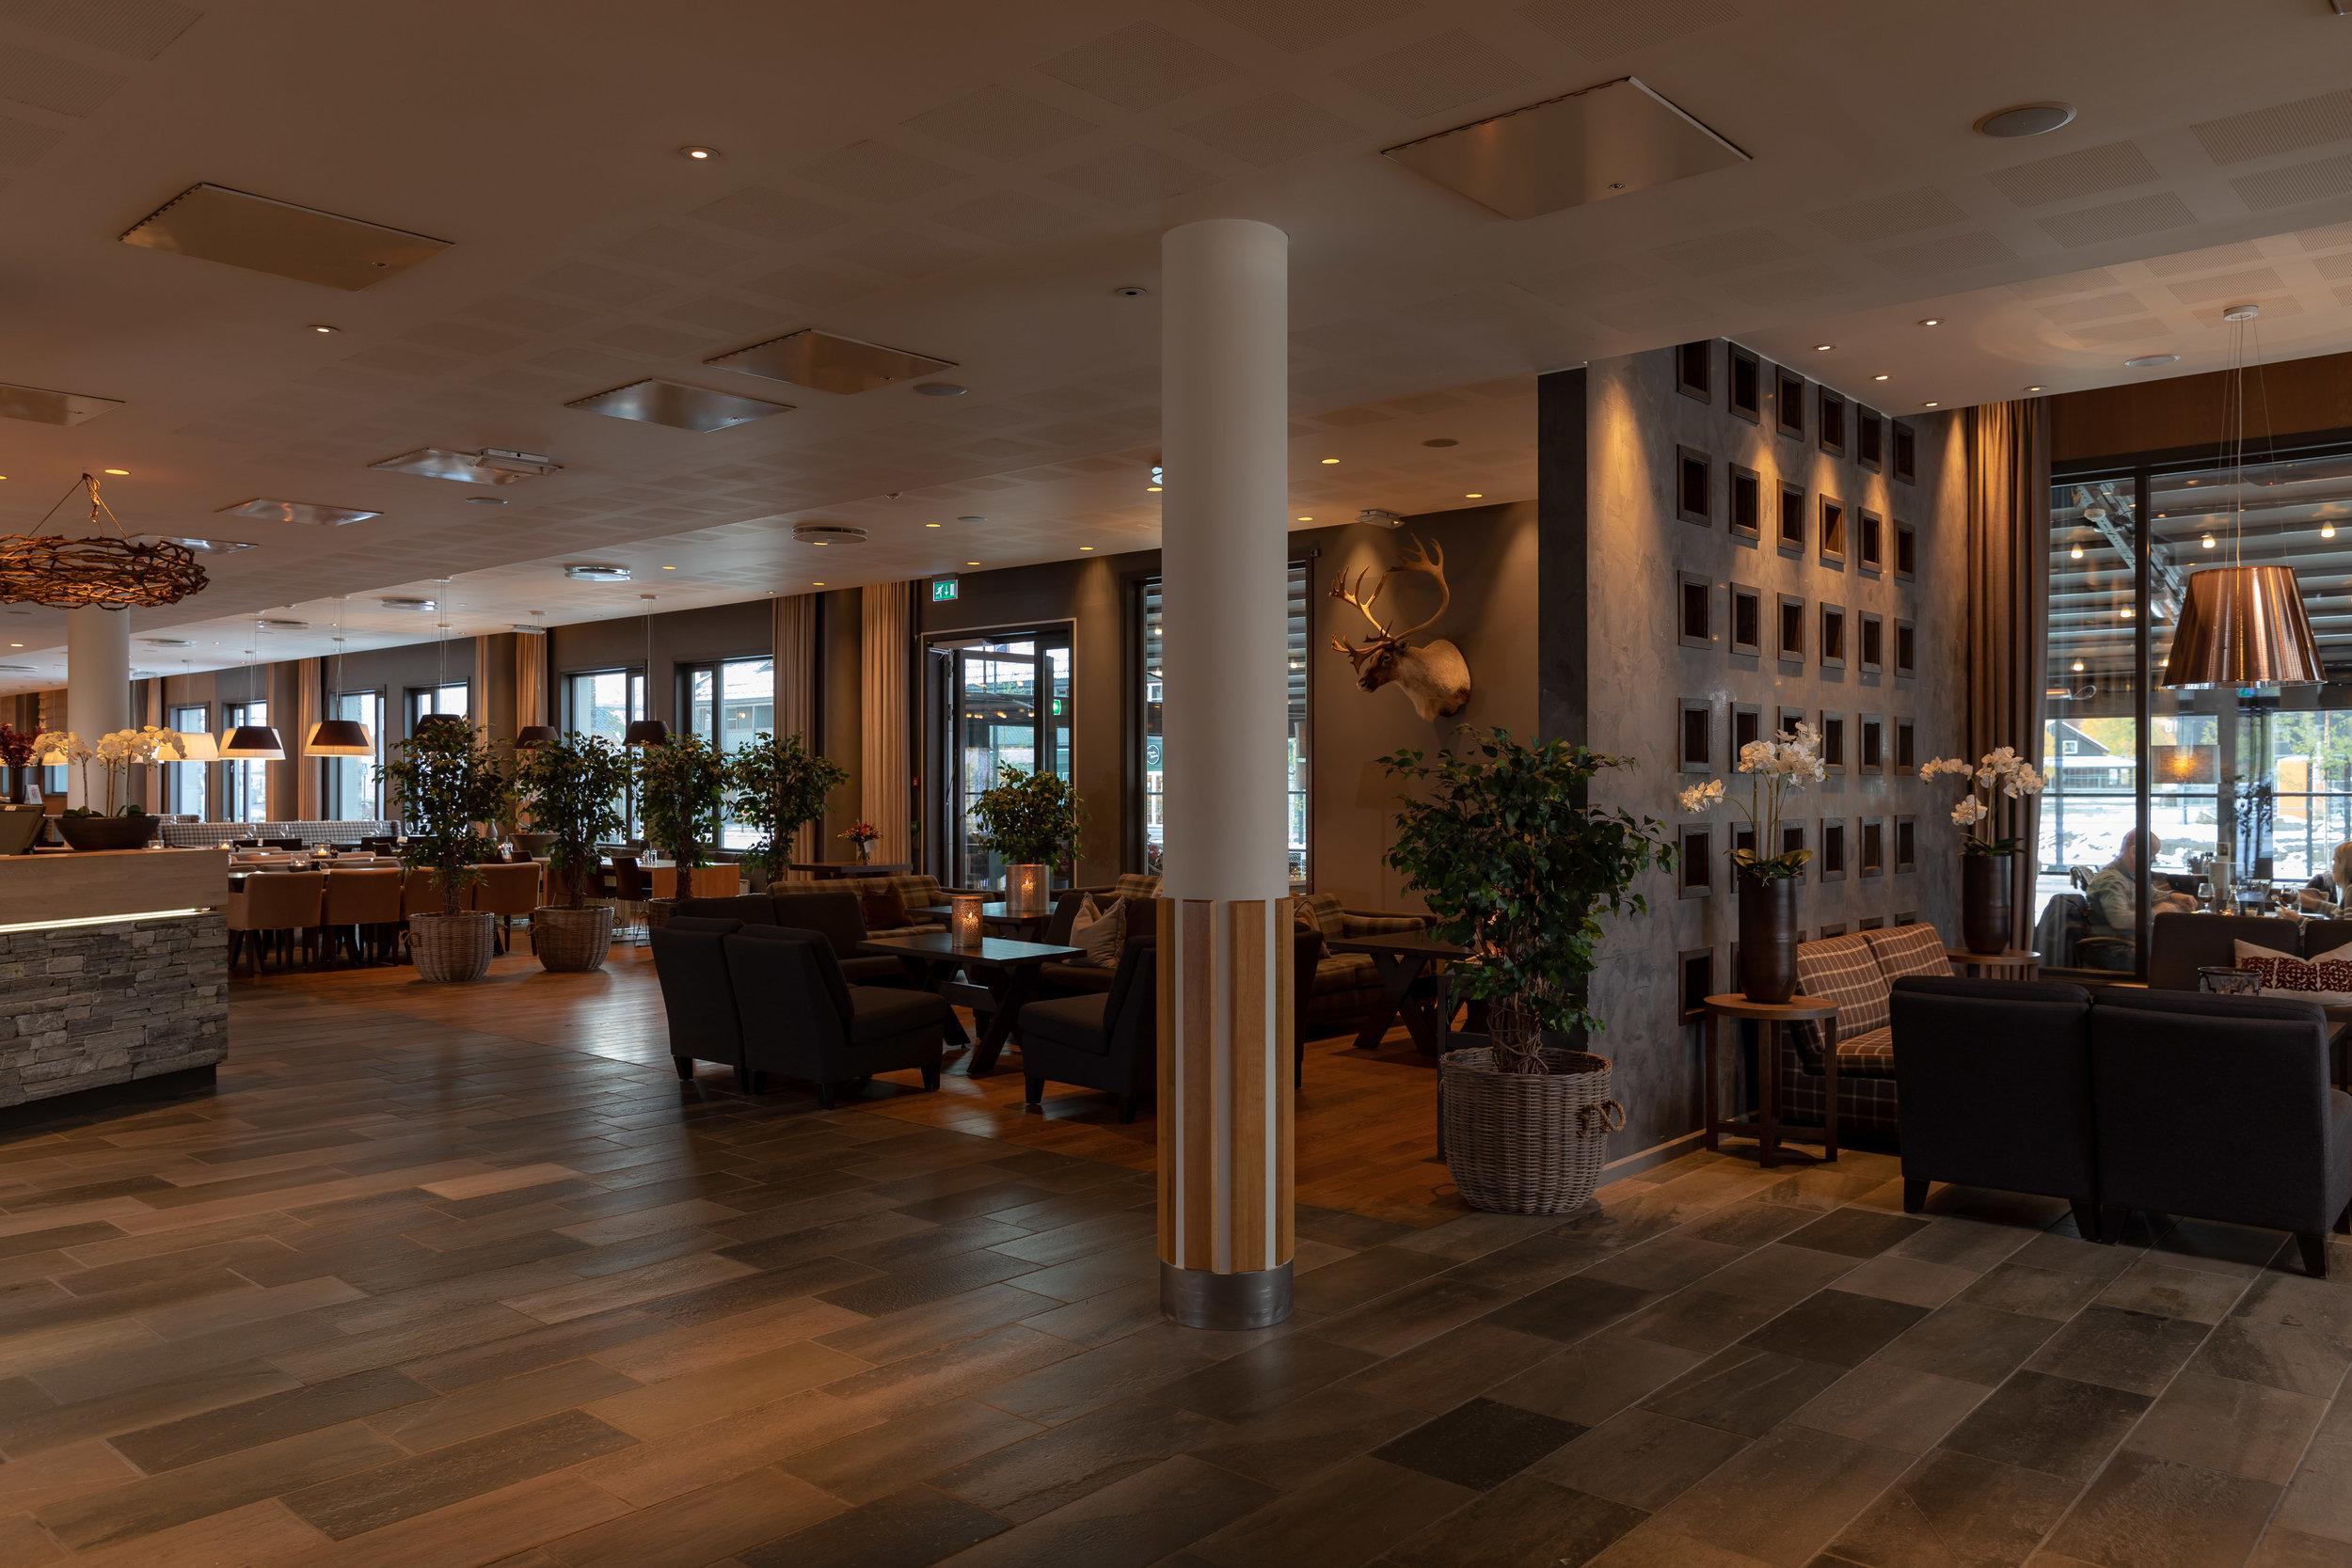 Skifer-Hotel-Oppdal-FotoKnoff-Sven-Erik-Knoff-0876.jpg